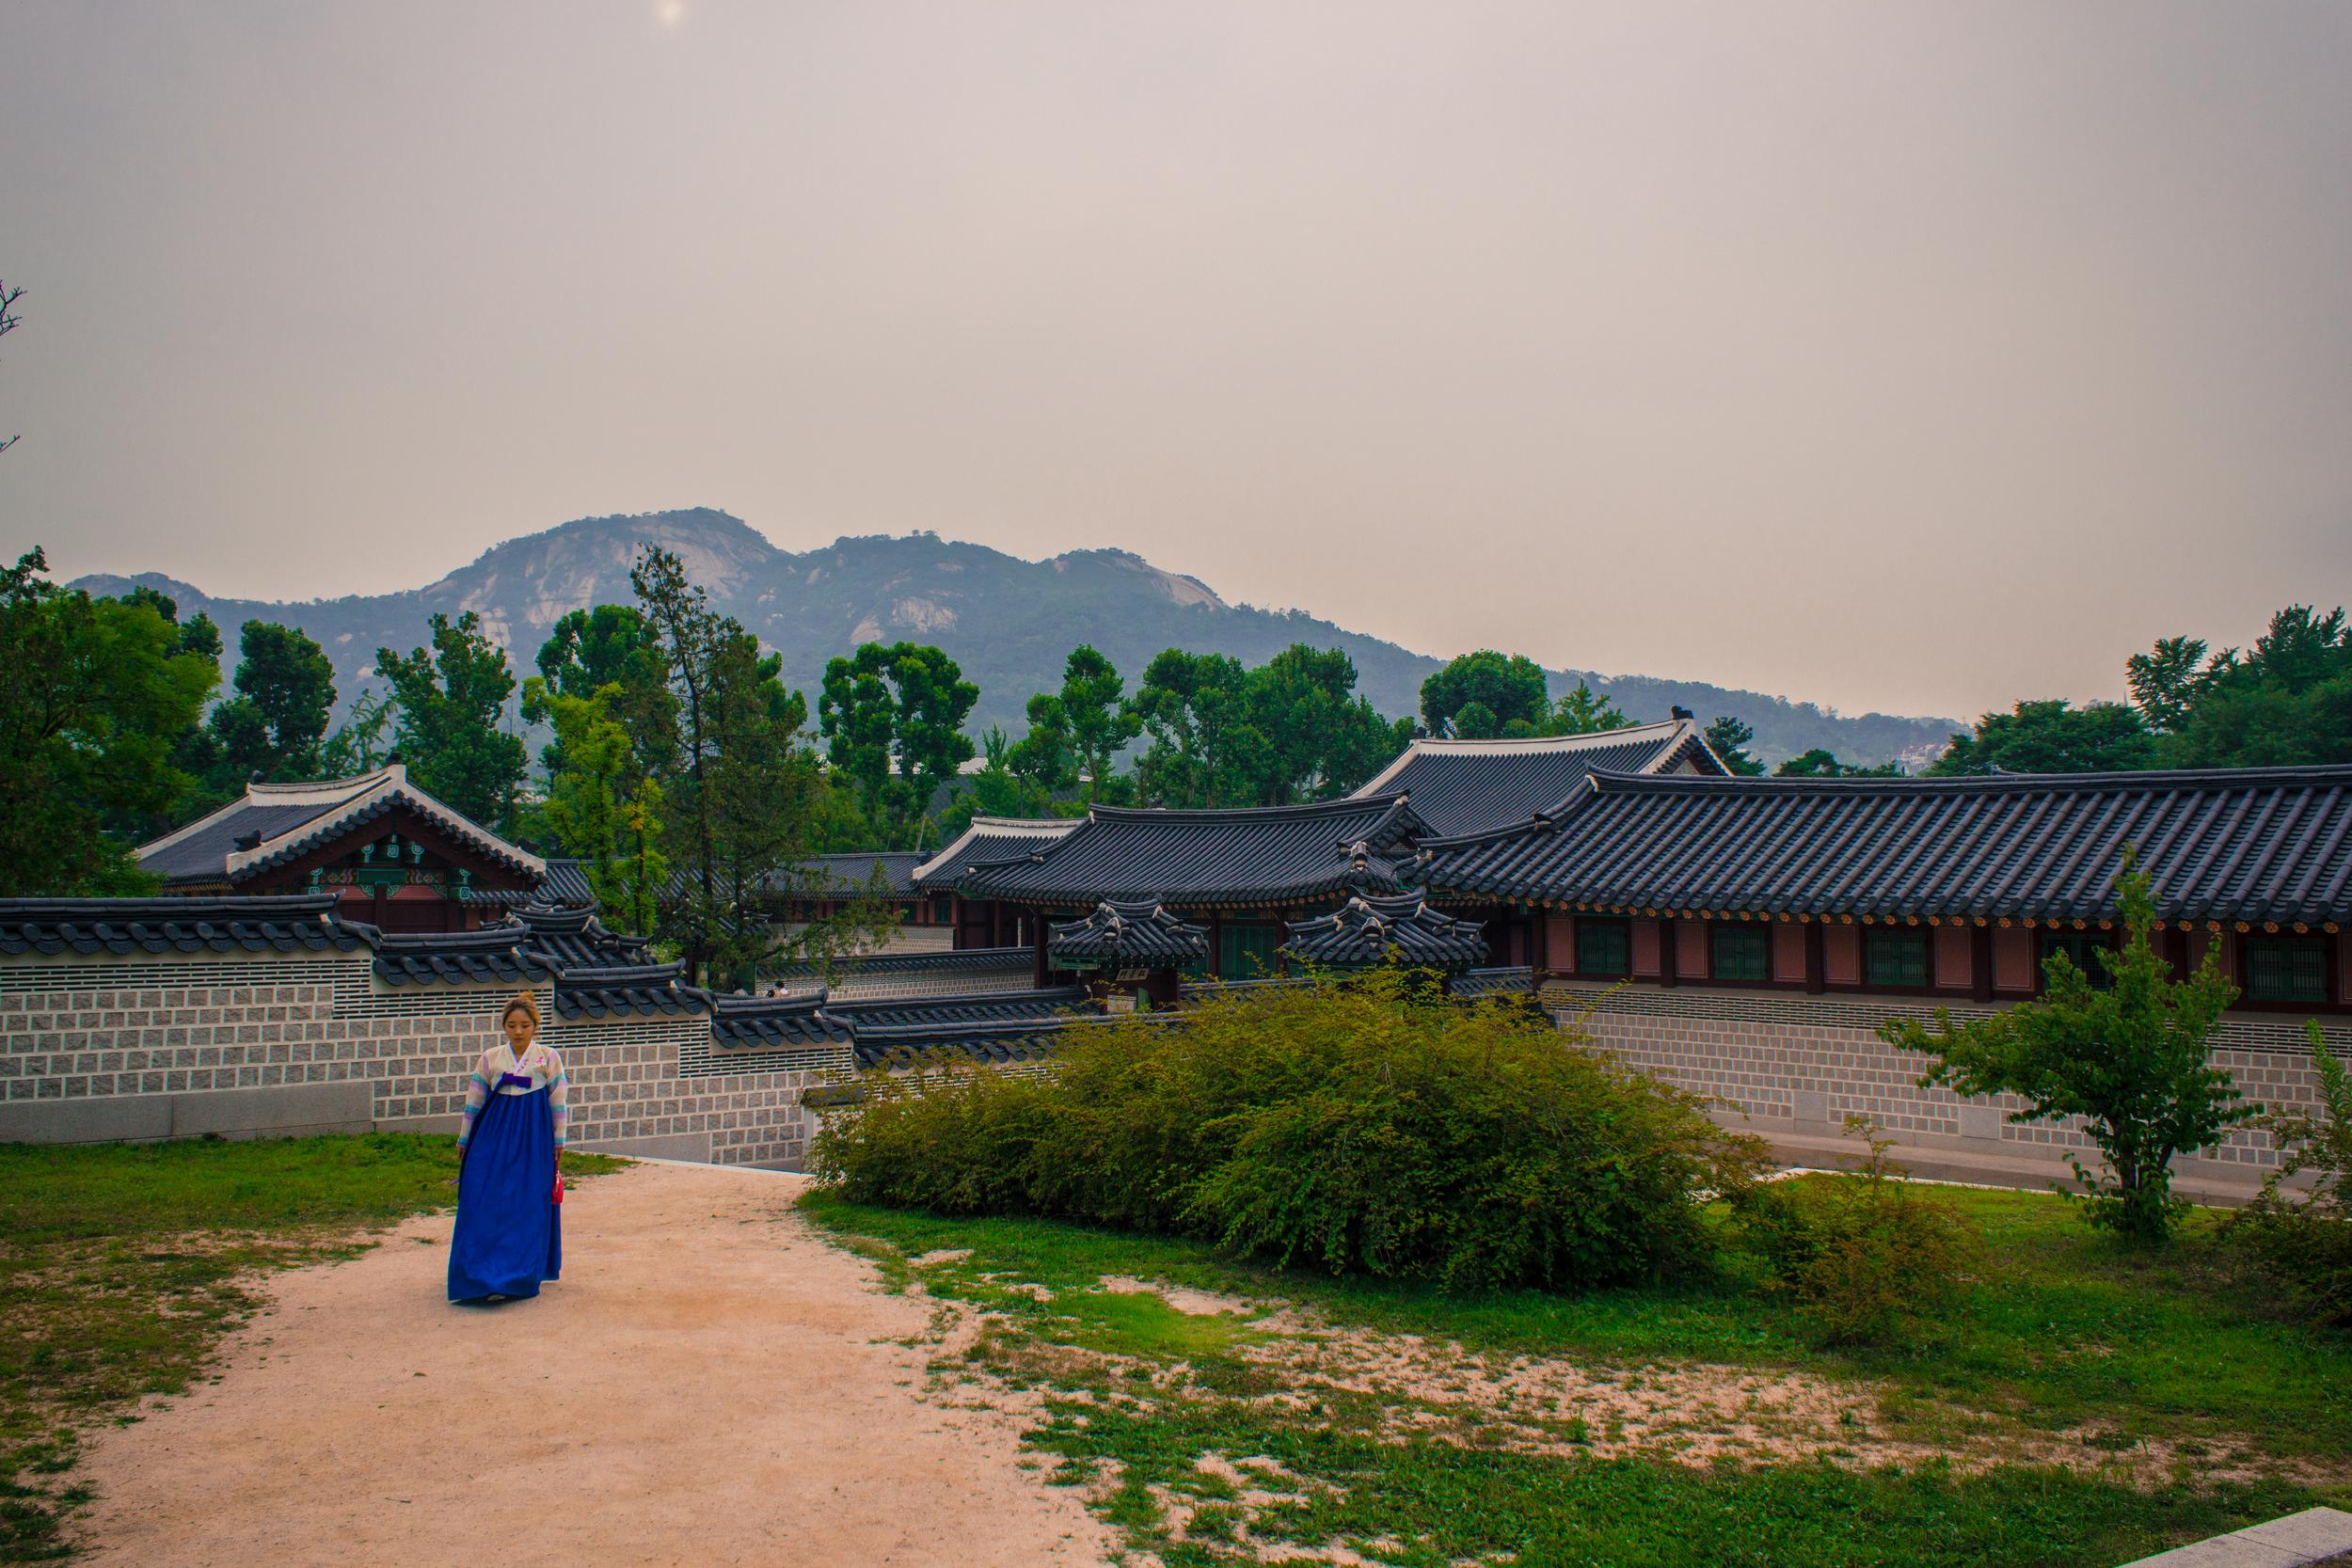 Gyeongbokgung Palace - Seoul Travel Guide - Let's Go Bravo